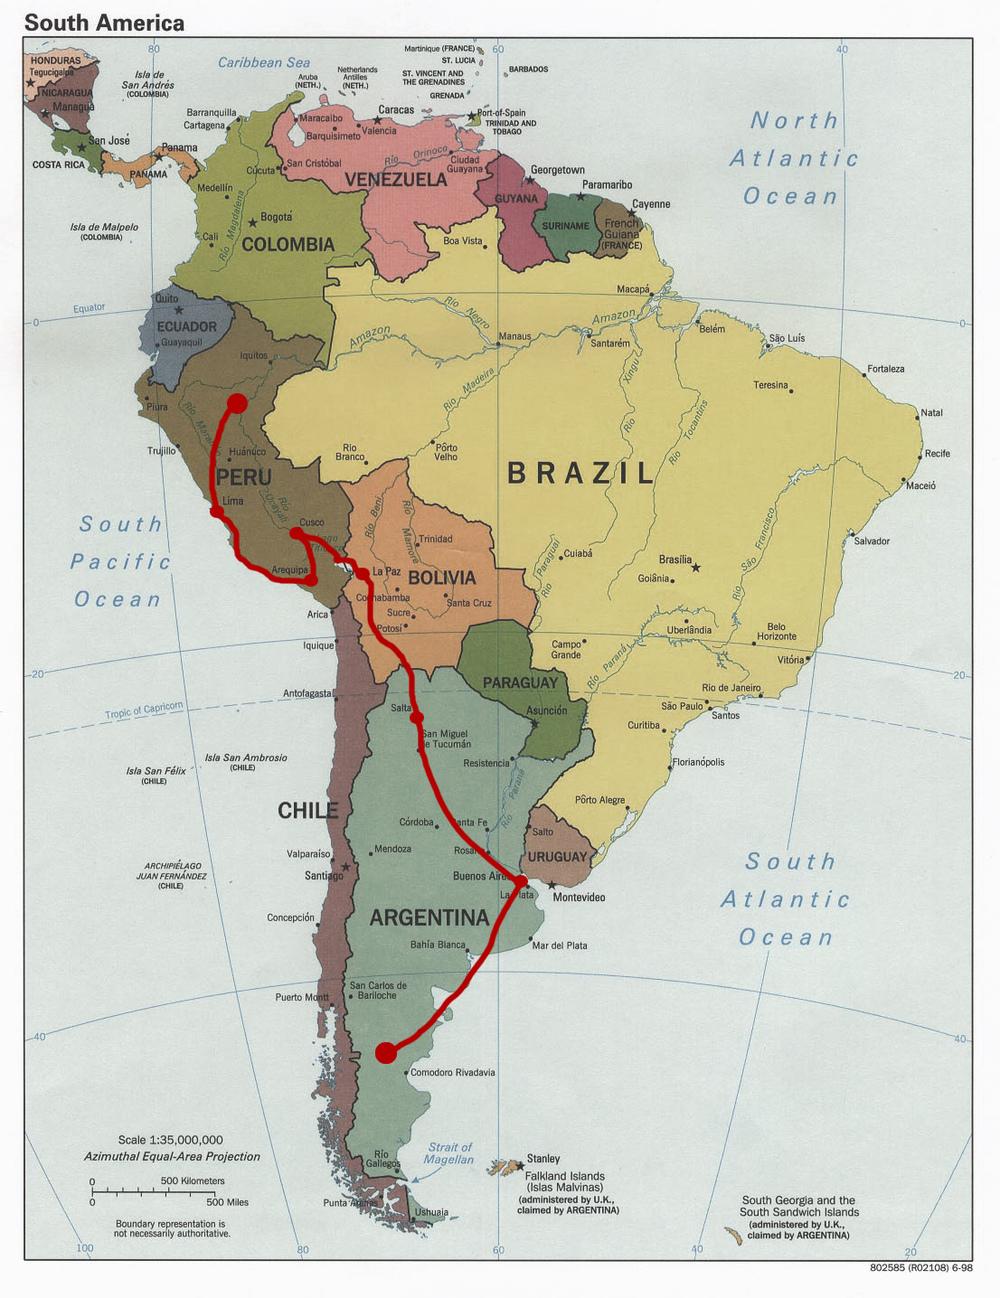 My route through Peru, Bolivia and Argentina